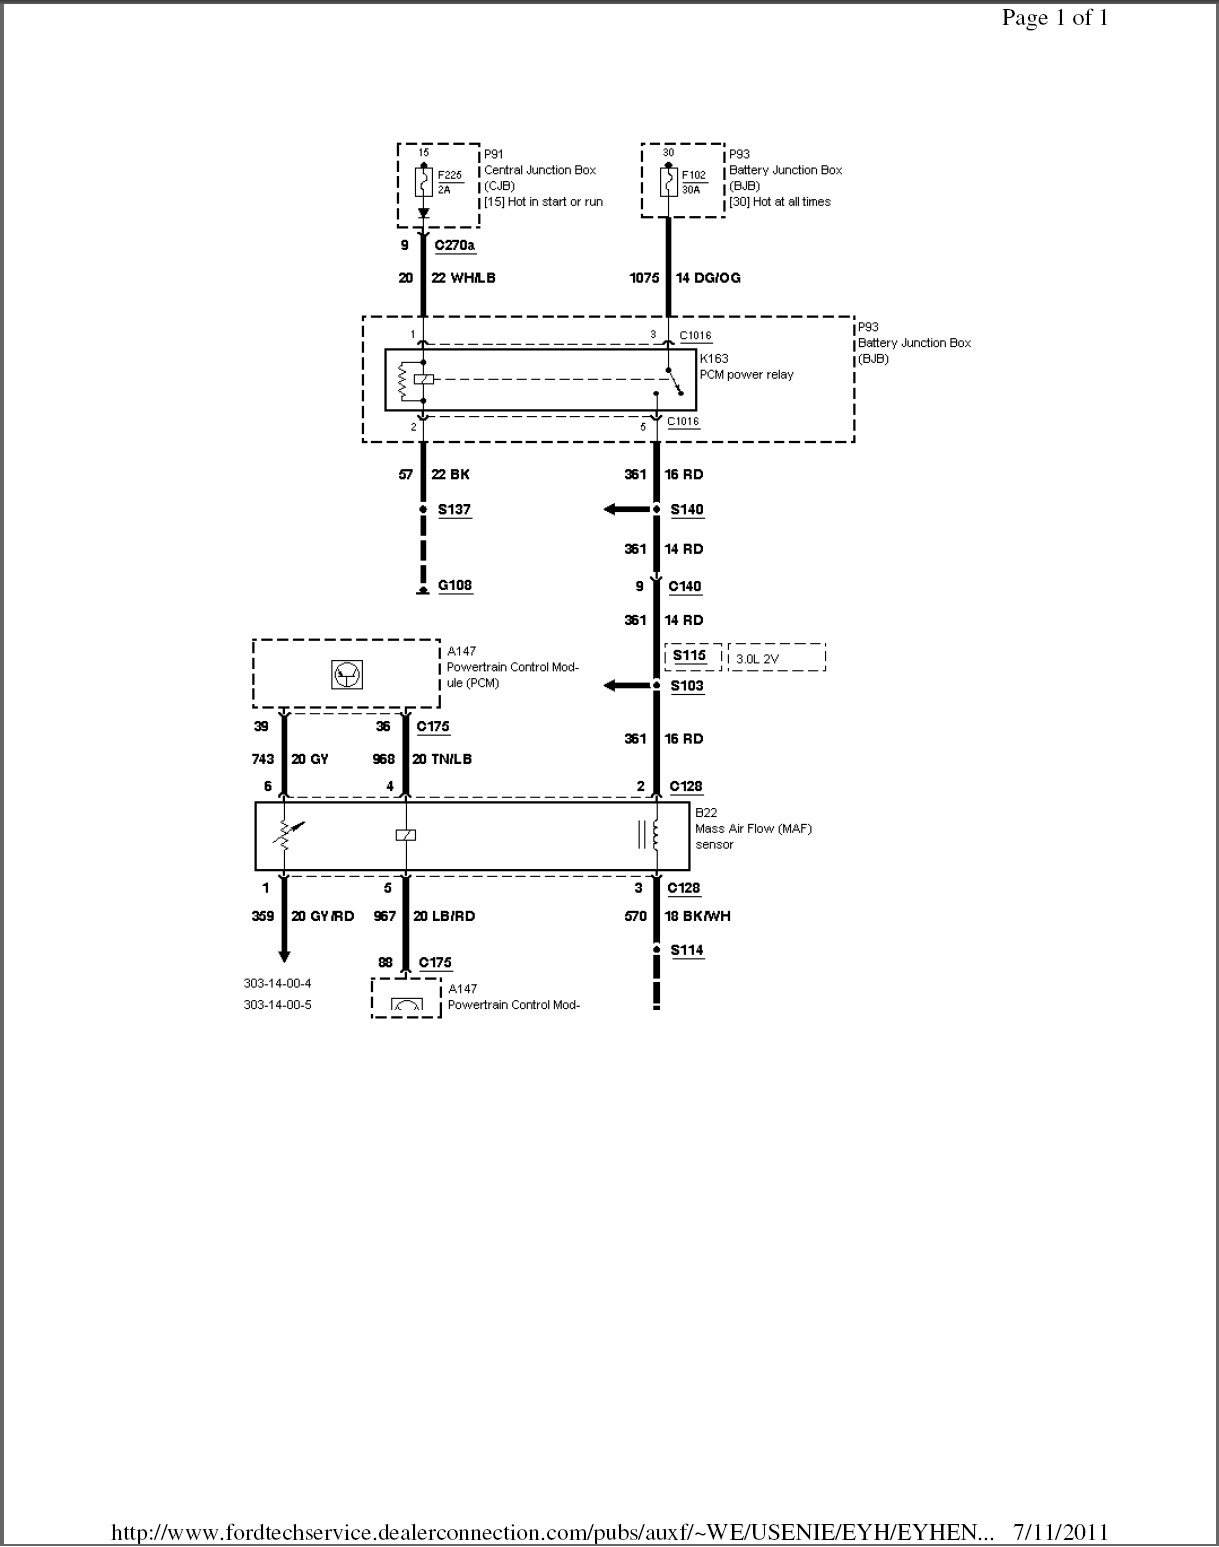 Need Wiring Diagram For 2000 Ford Taurus 2001 Ses Duratec Engine Superbob Senior Master Mazda